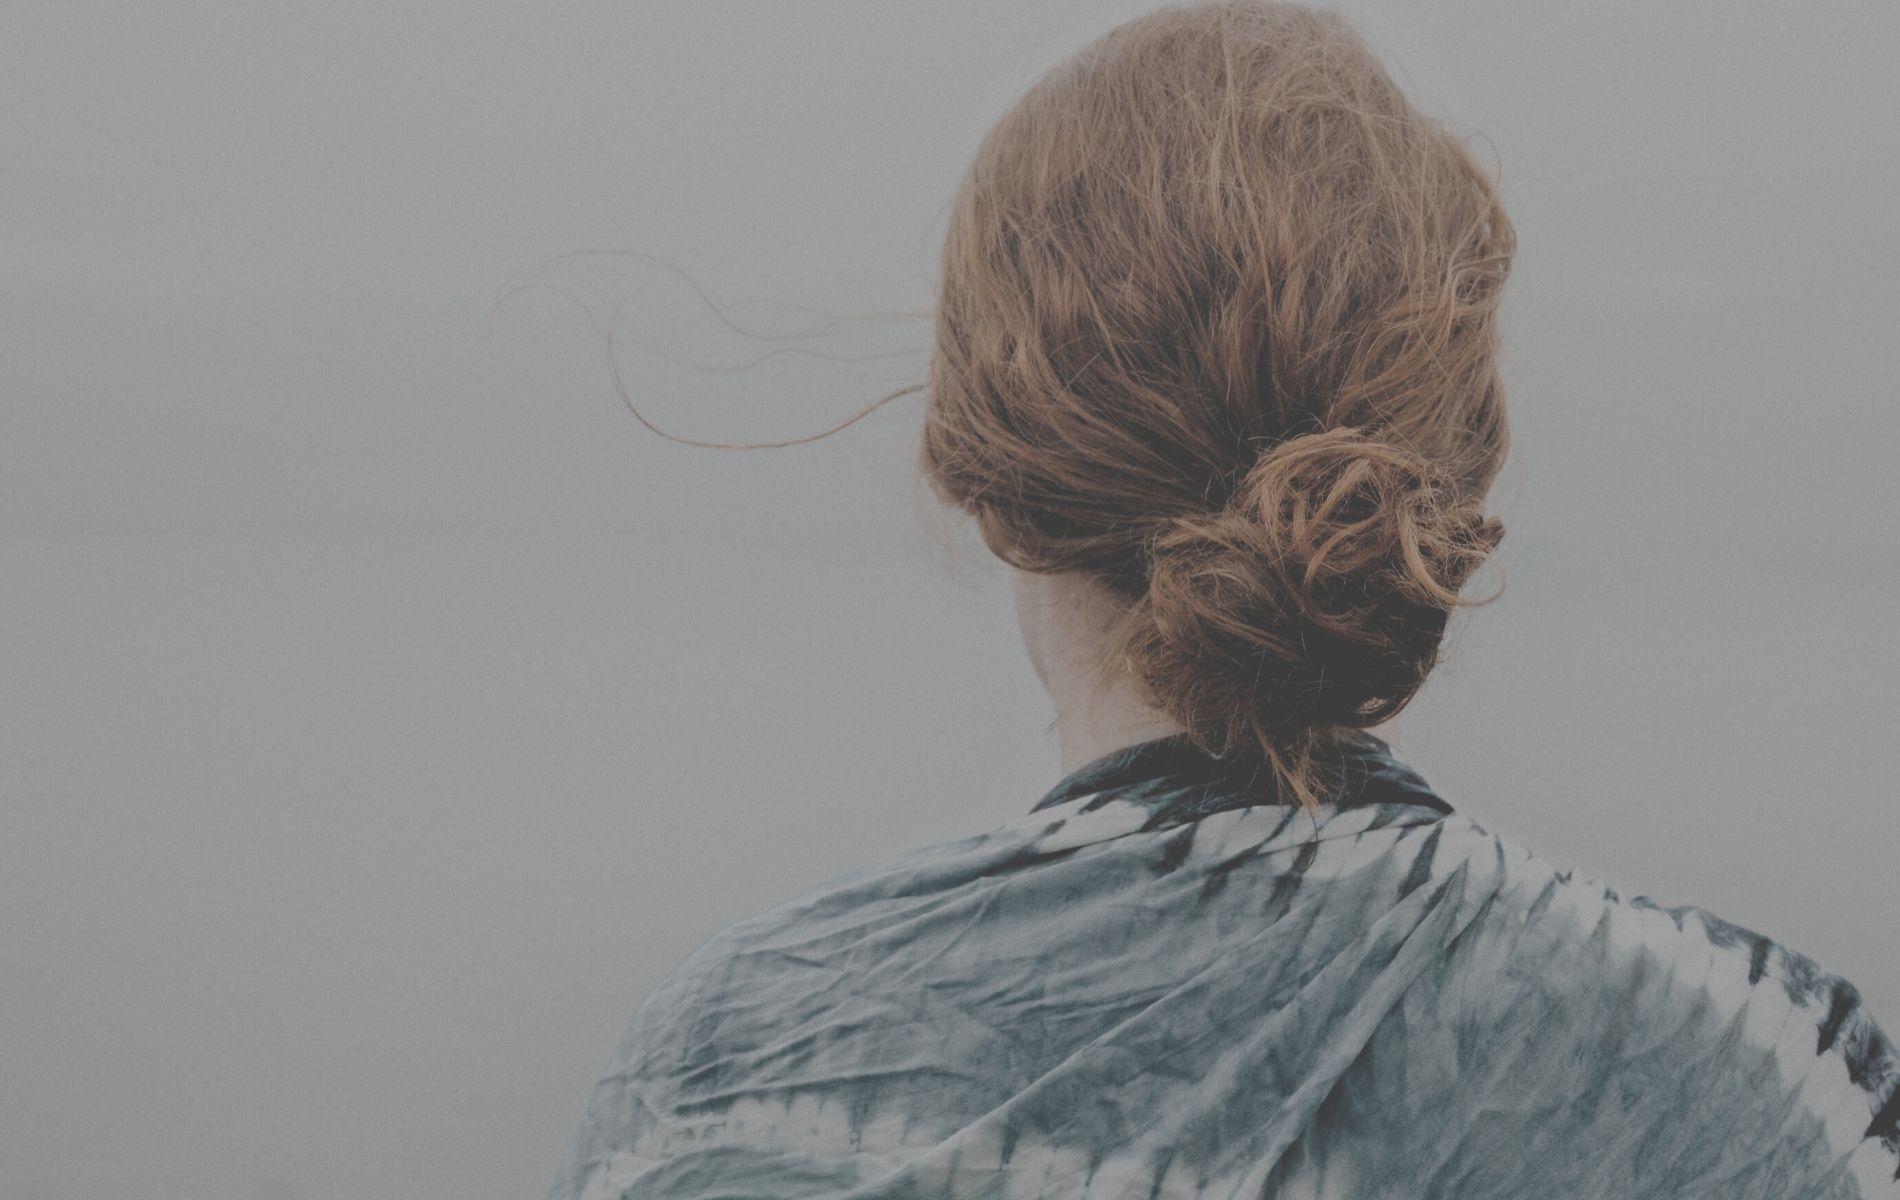 Psiholosko zdravlje - predavanje za stipendiste Fondacije Izvor nade